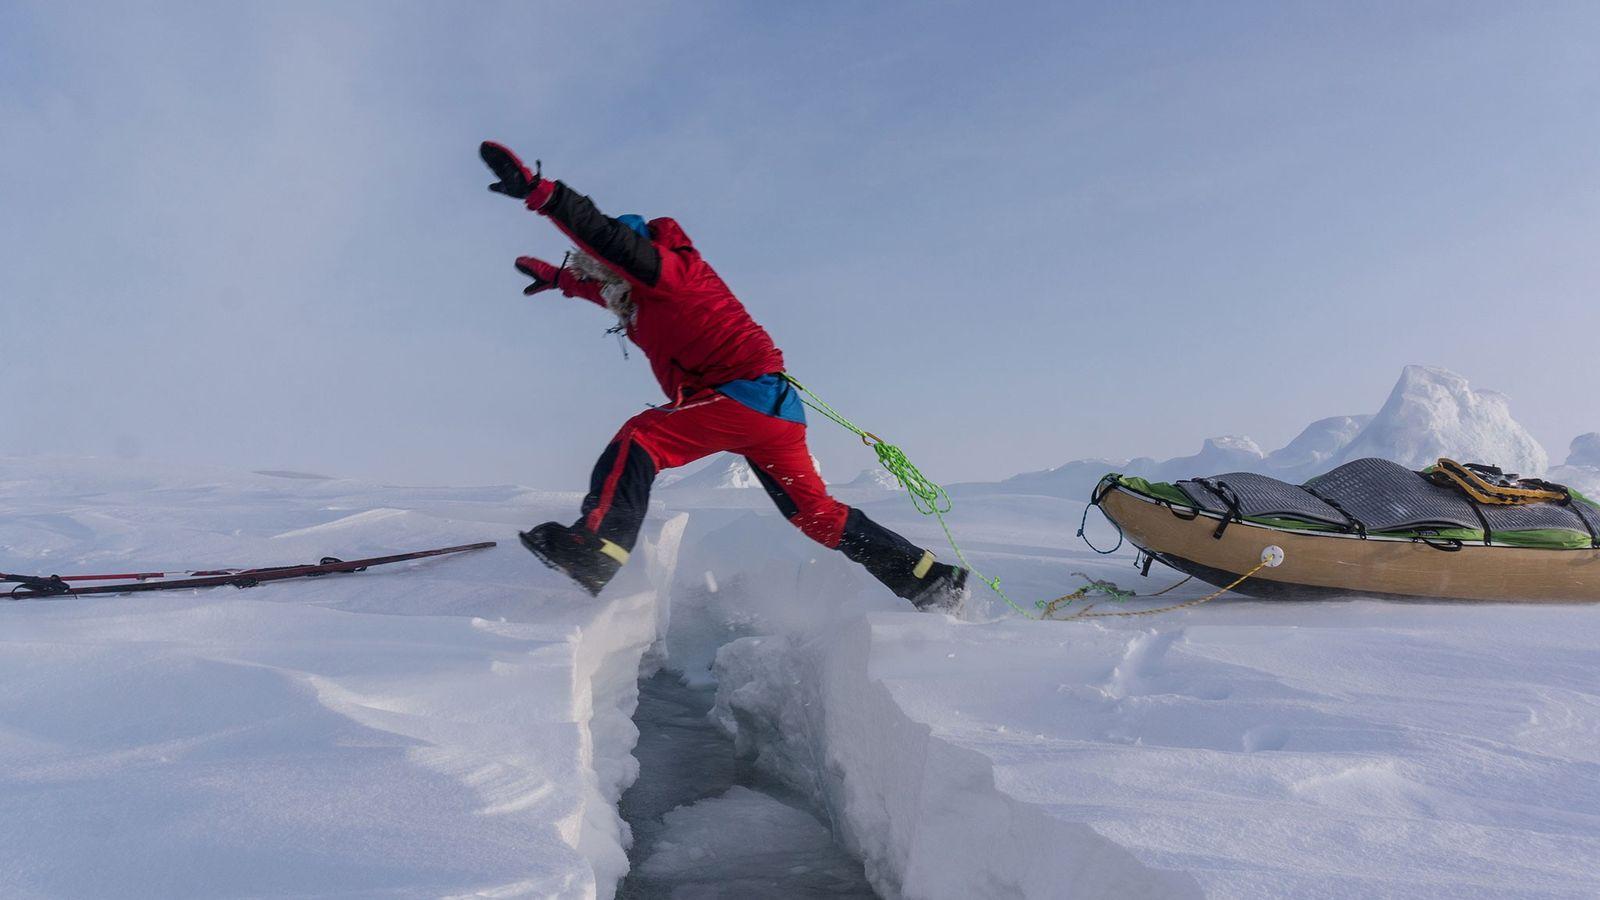 eric-larsen-espalhando-o-proprio-peso-gelo-fino